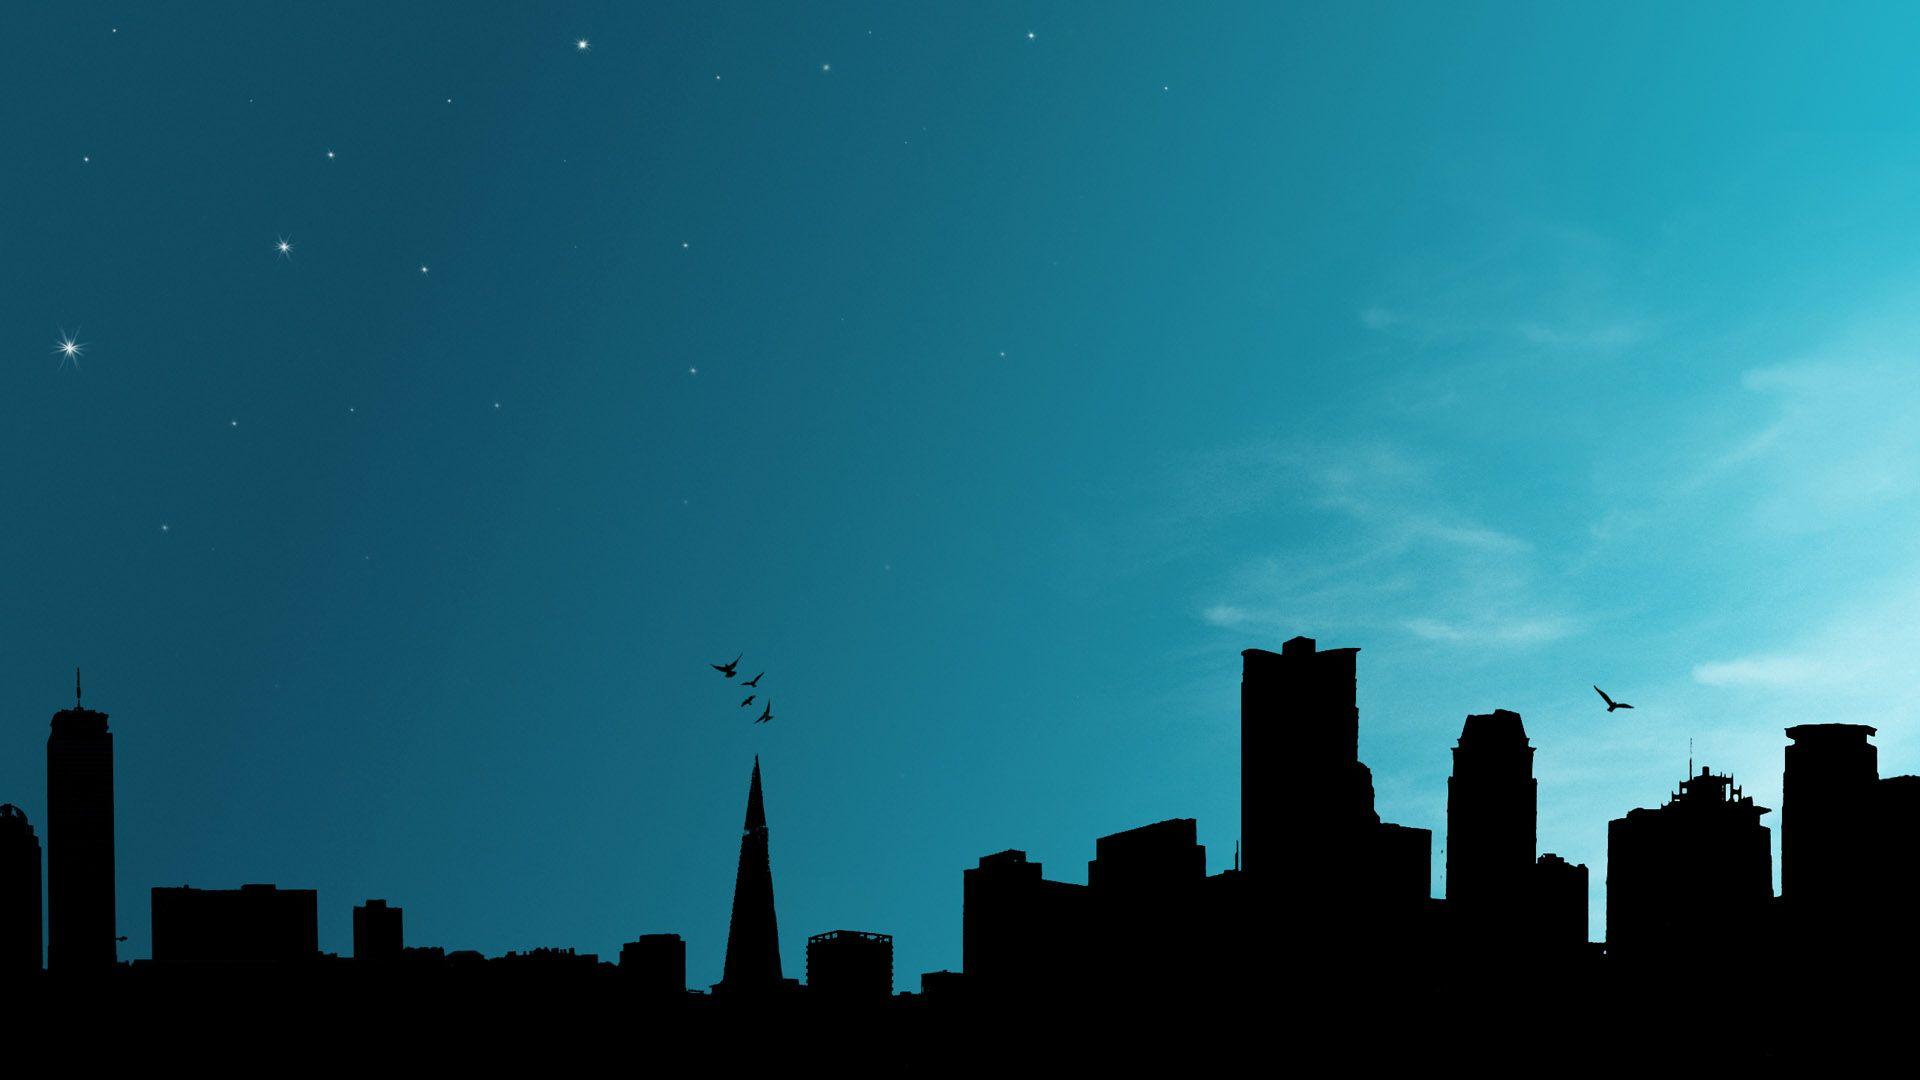 Image for HD Background Art City Wallpaper | Что надеть ...